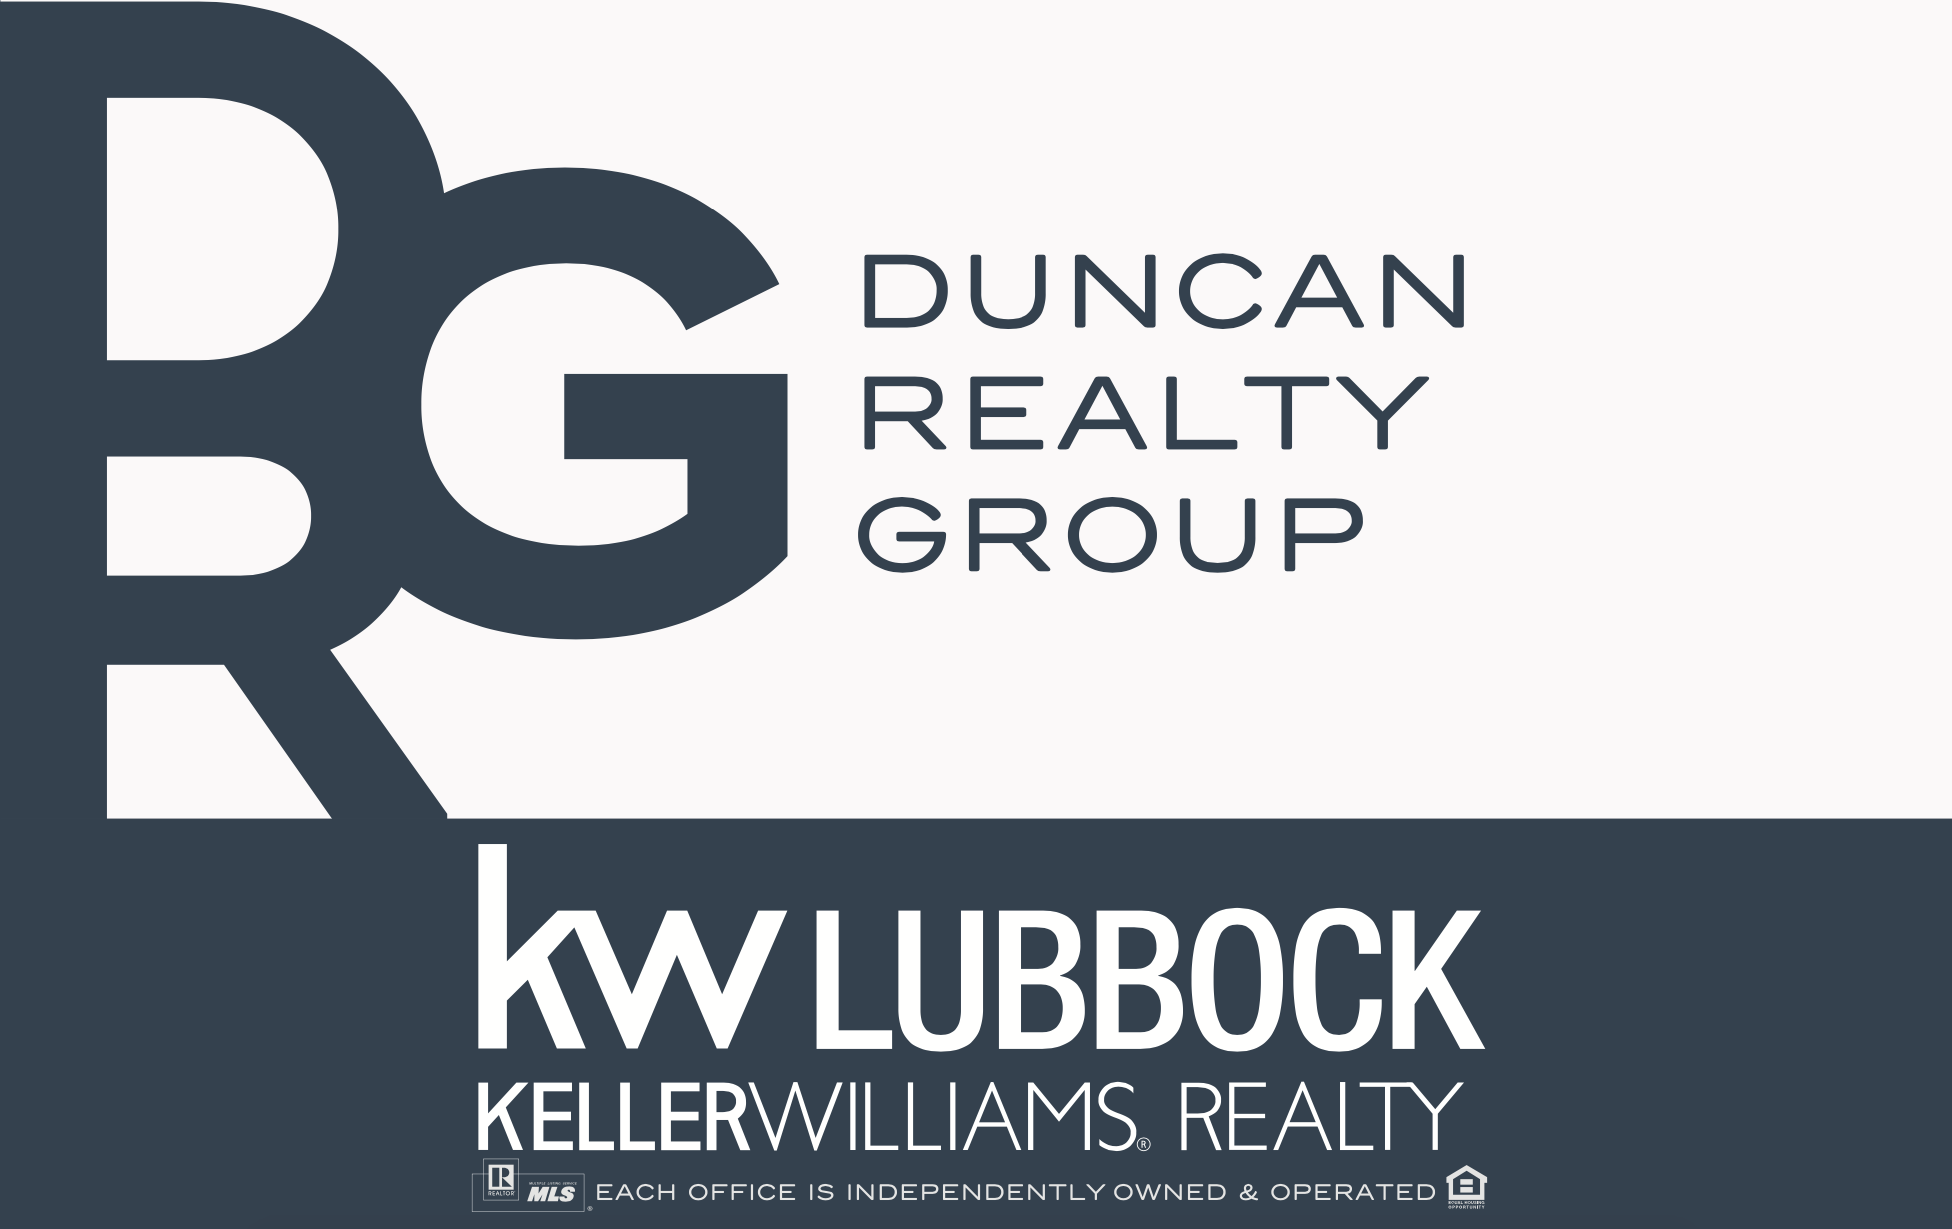 Duncan Realty Group at KW logo